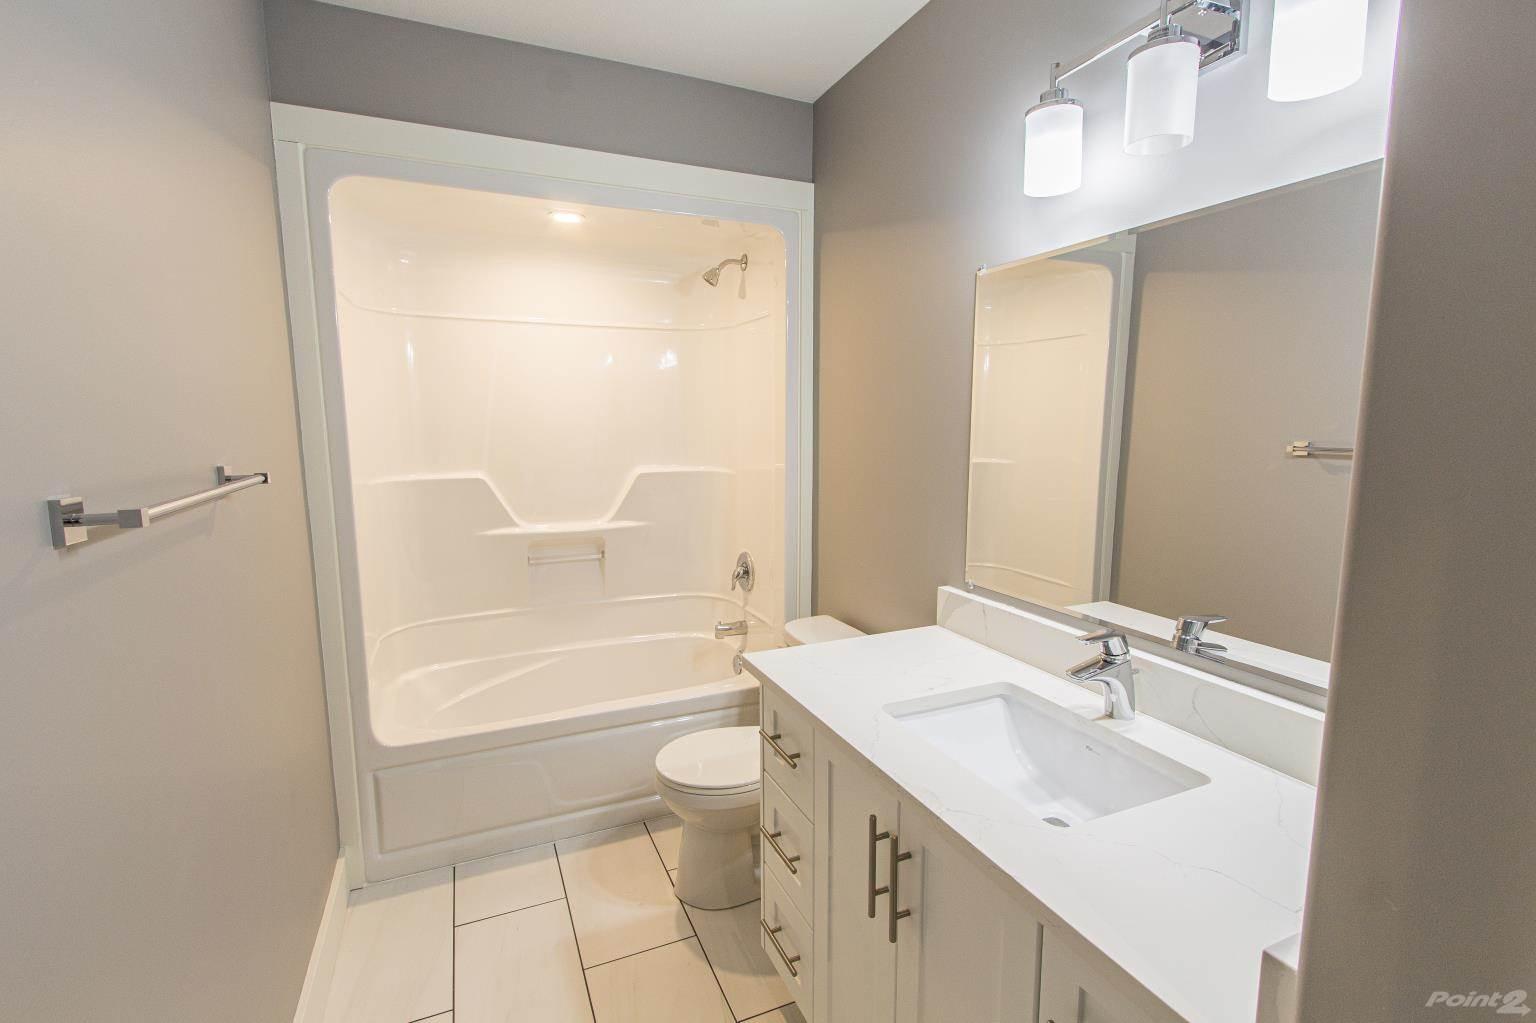 215 Terra Nova Cres in Cold Lake - House For Sale : MLS# e4225242 Photo 8